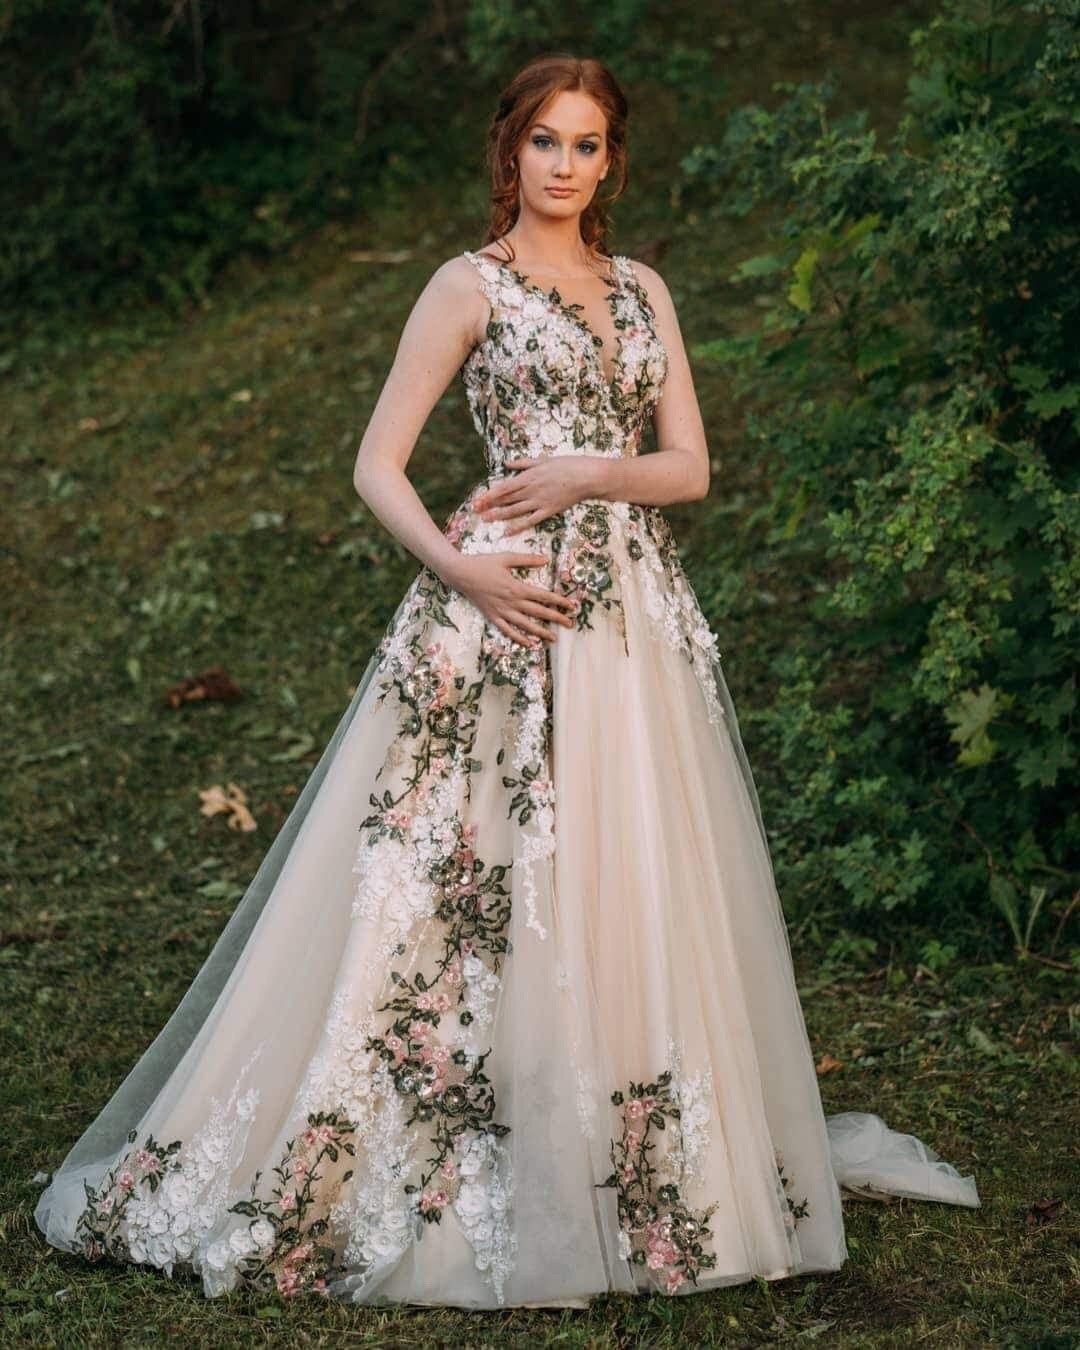 Ivory Floral Forest Wedding Dress Inga Ezergale Design Forest Collection Nature Wedding Dress Forest Wedding Dress Green Wedding Dresses [ 1350 x 1080 Pixel ]